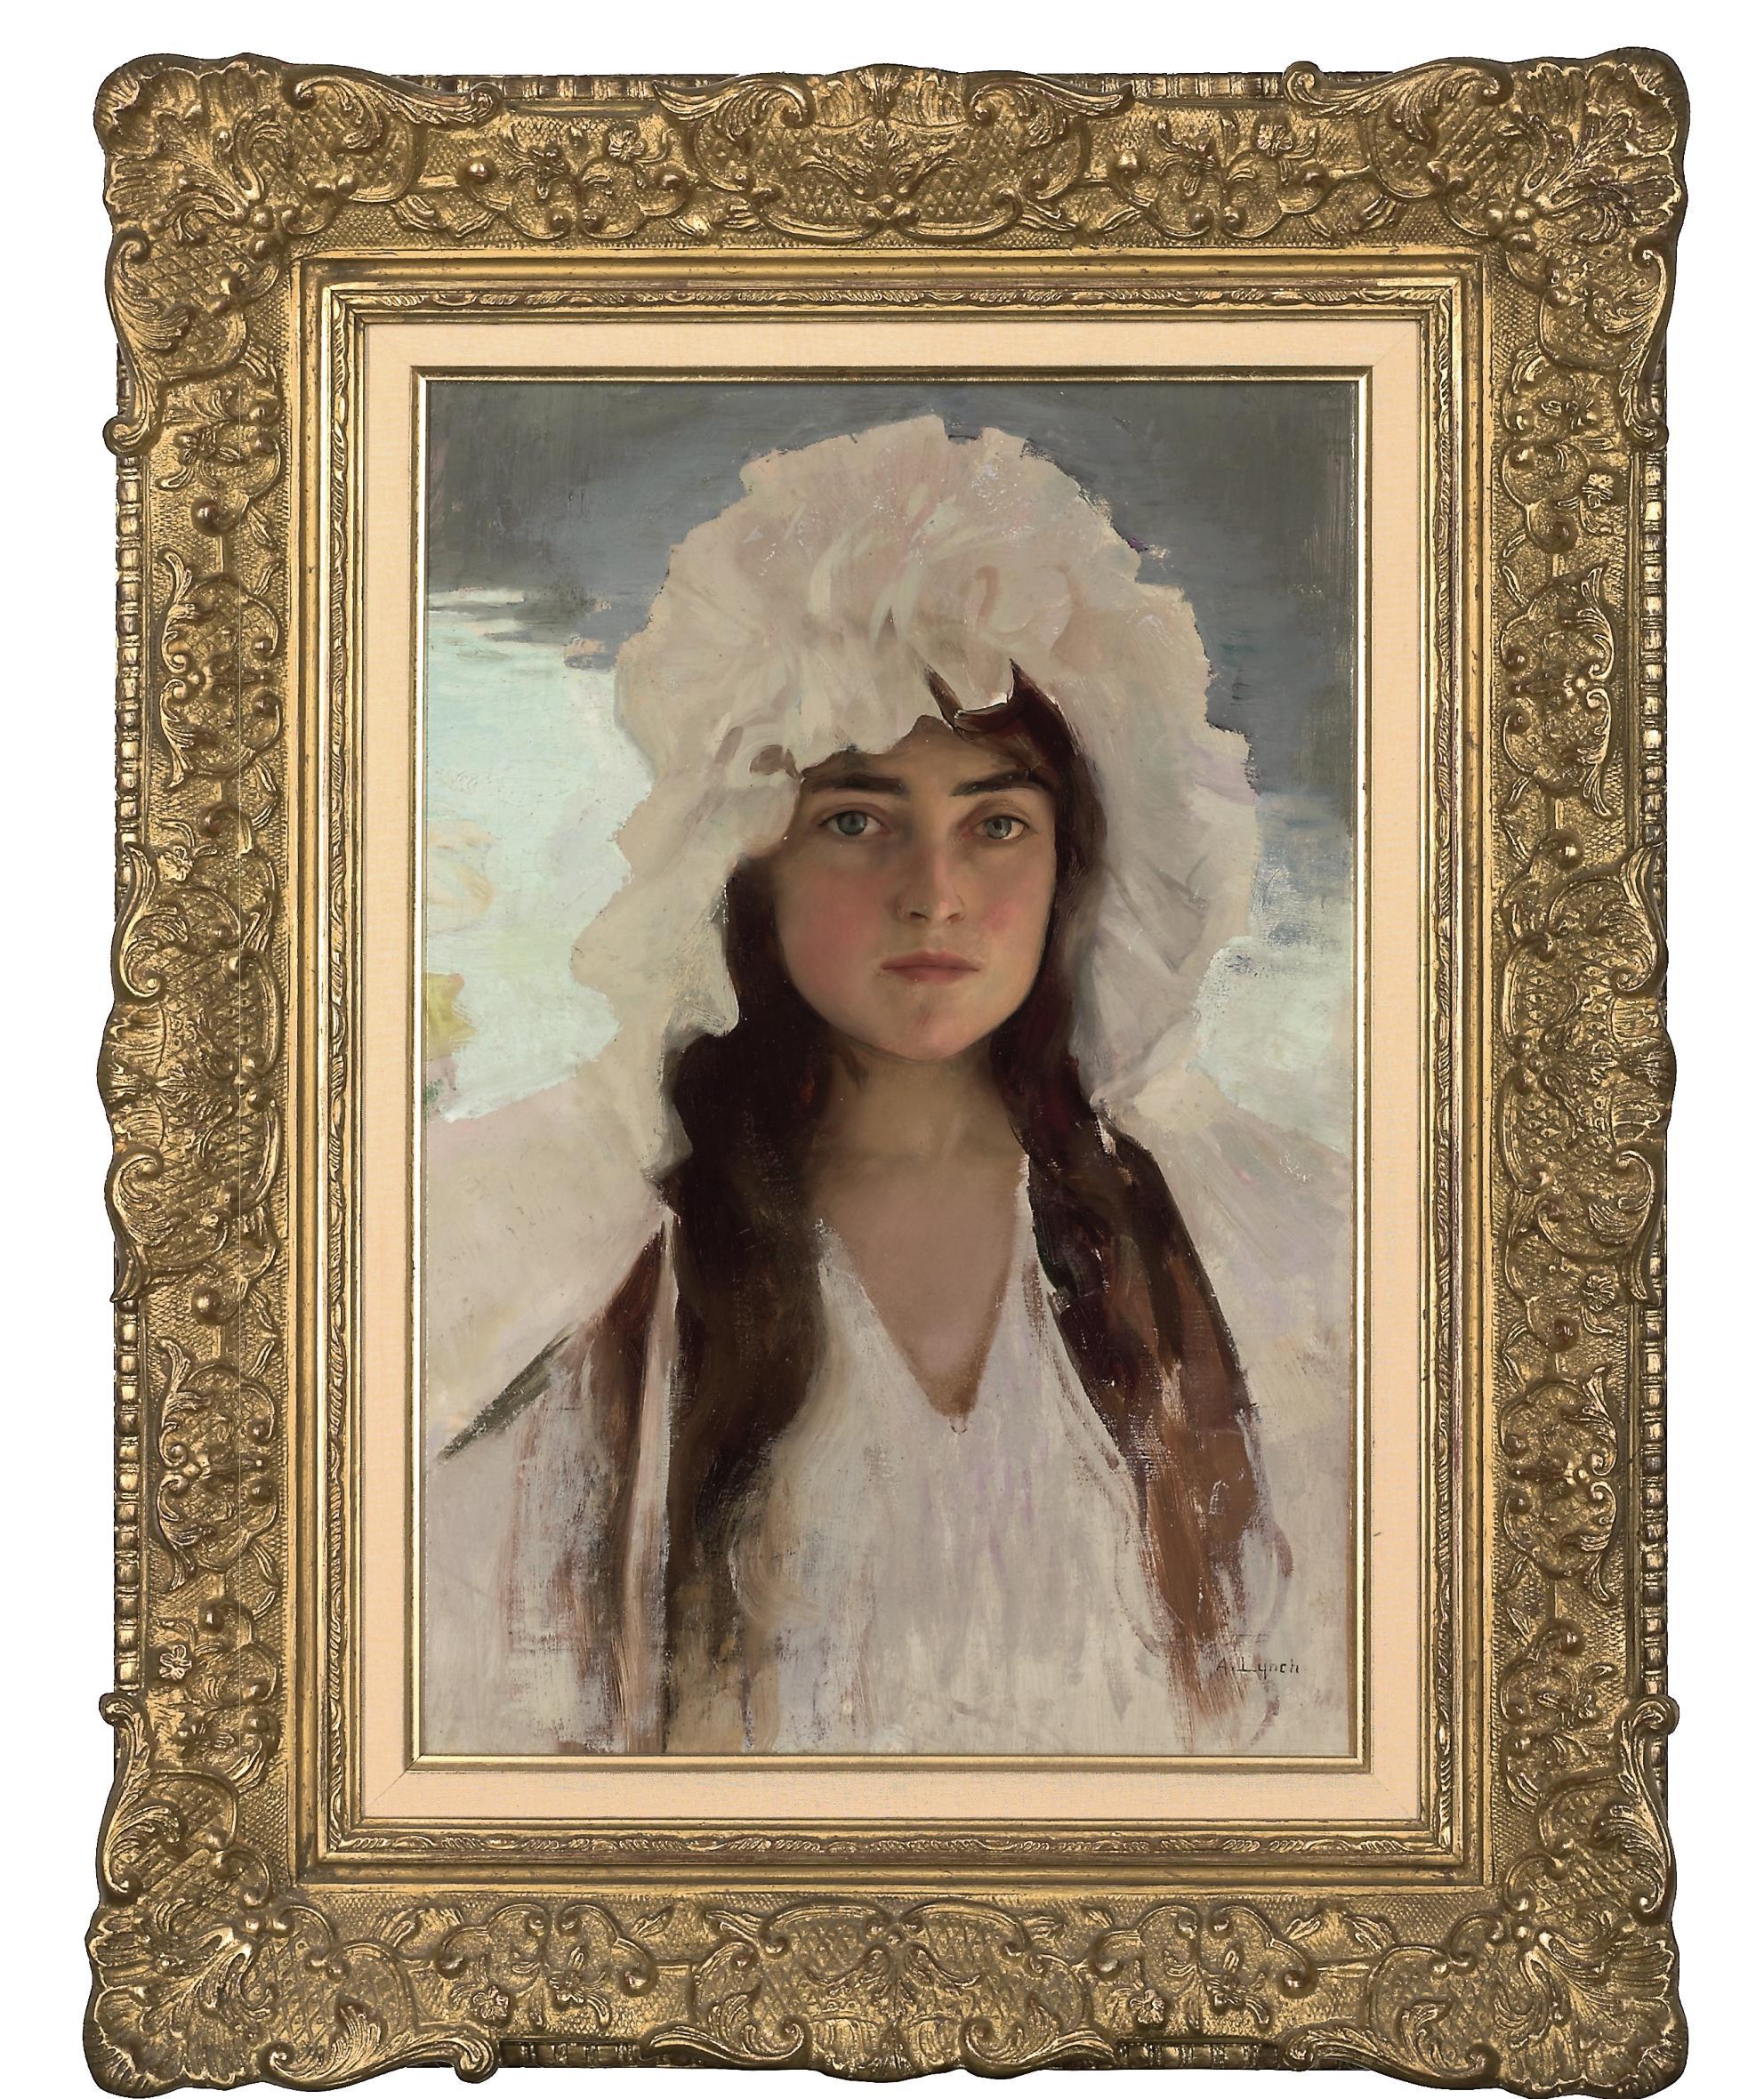 Portrait of a girl in a white bonnet